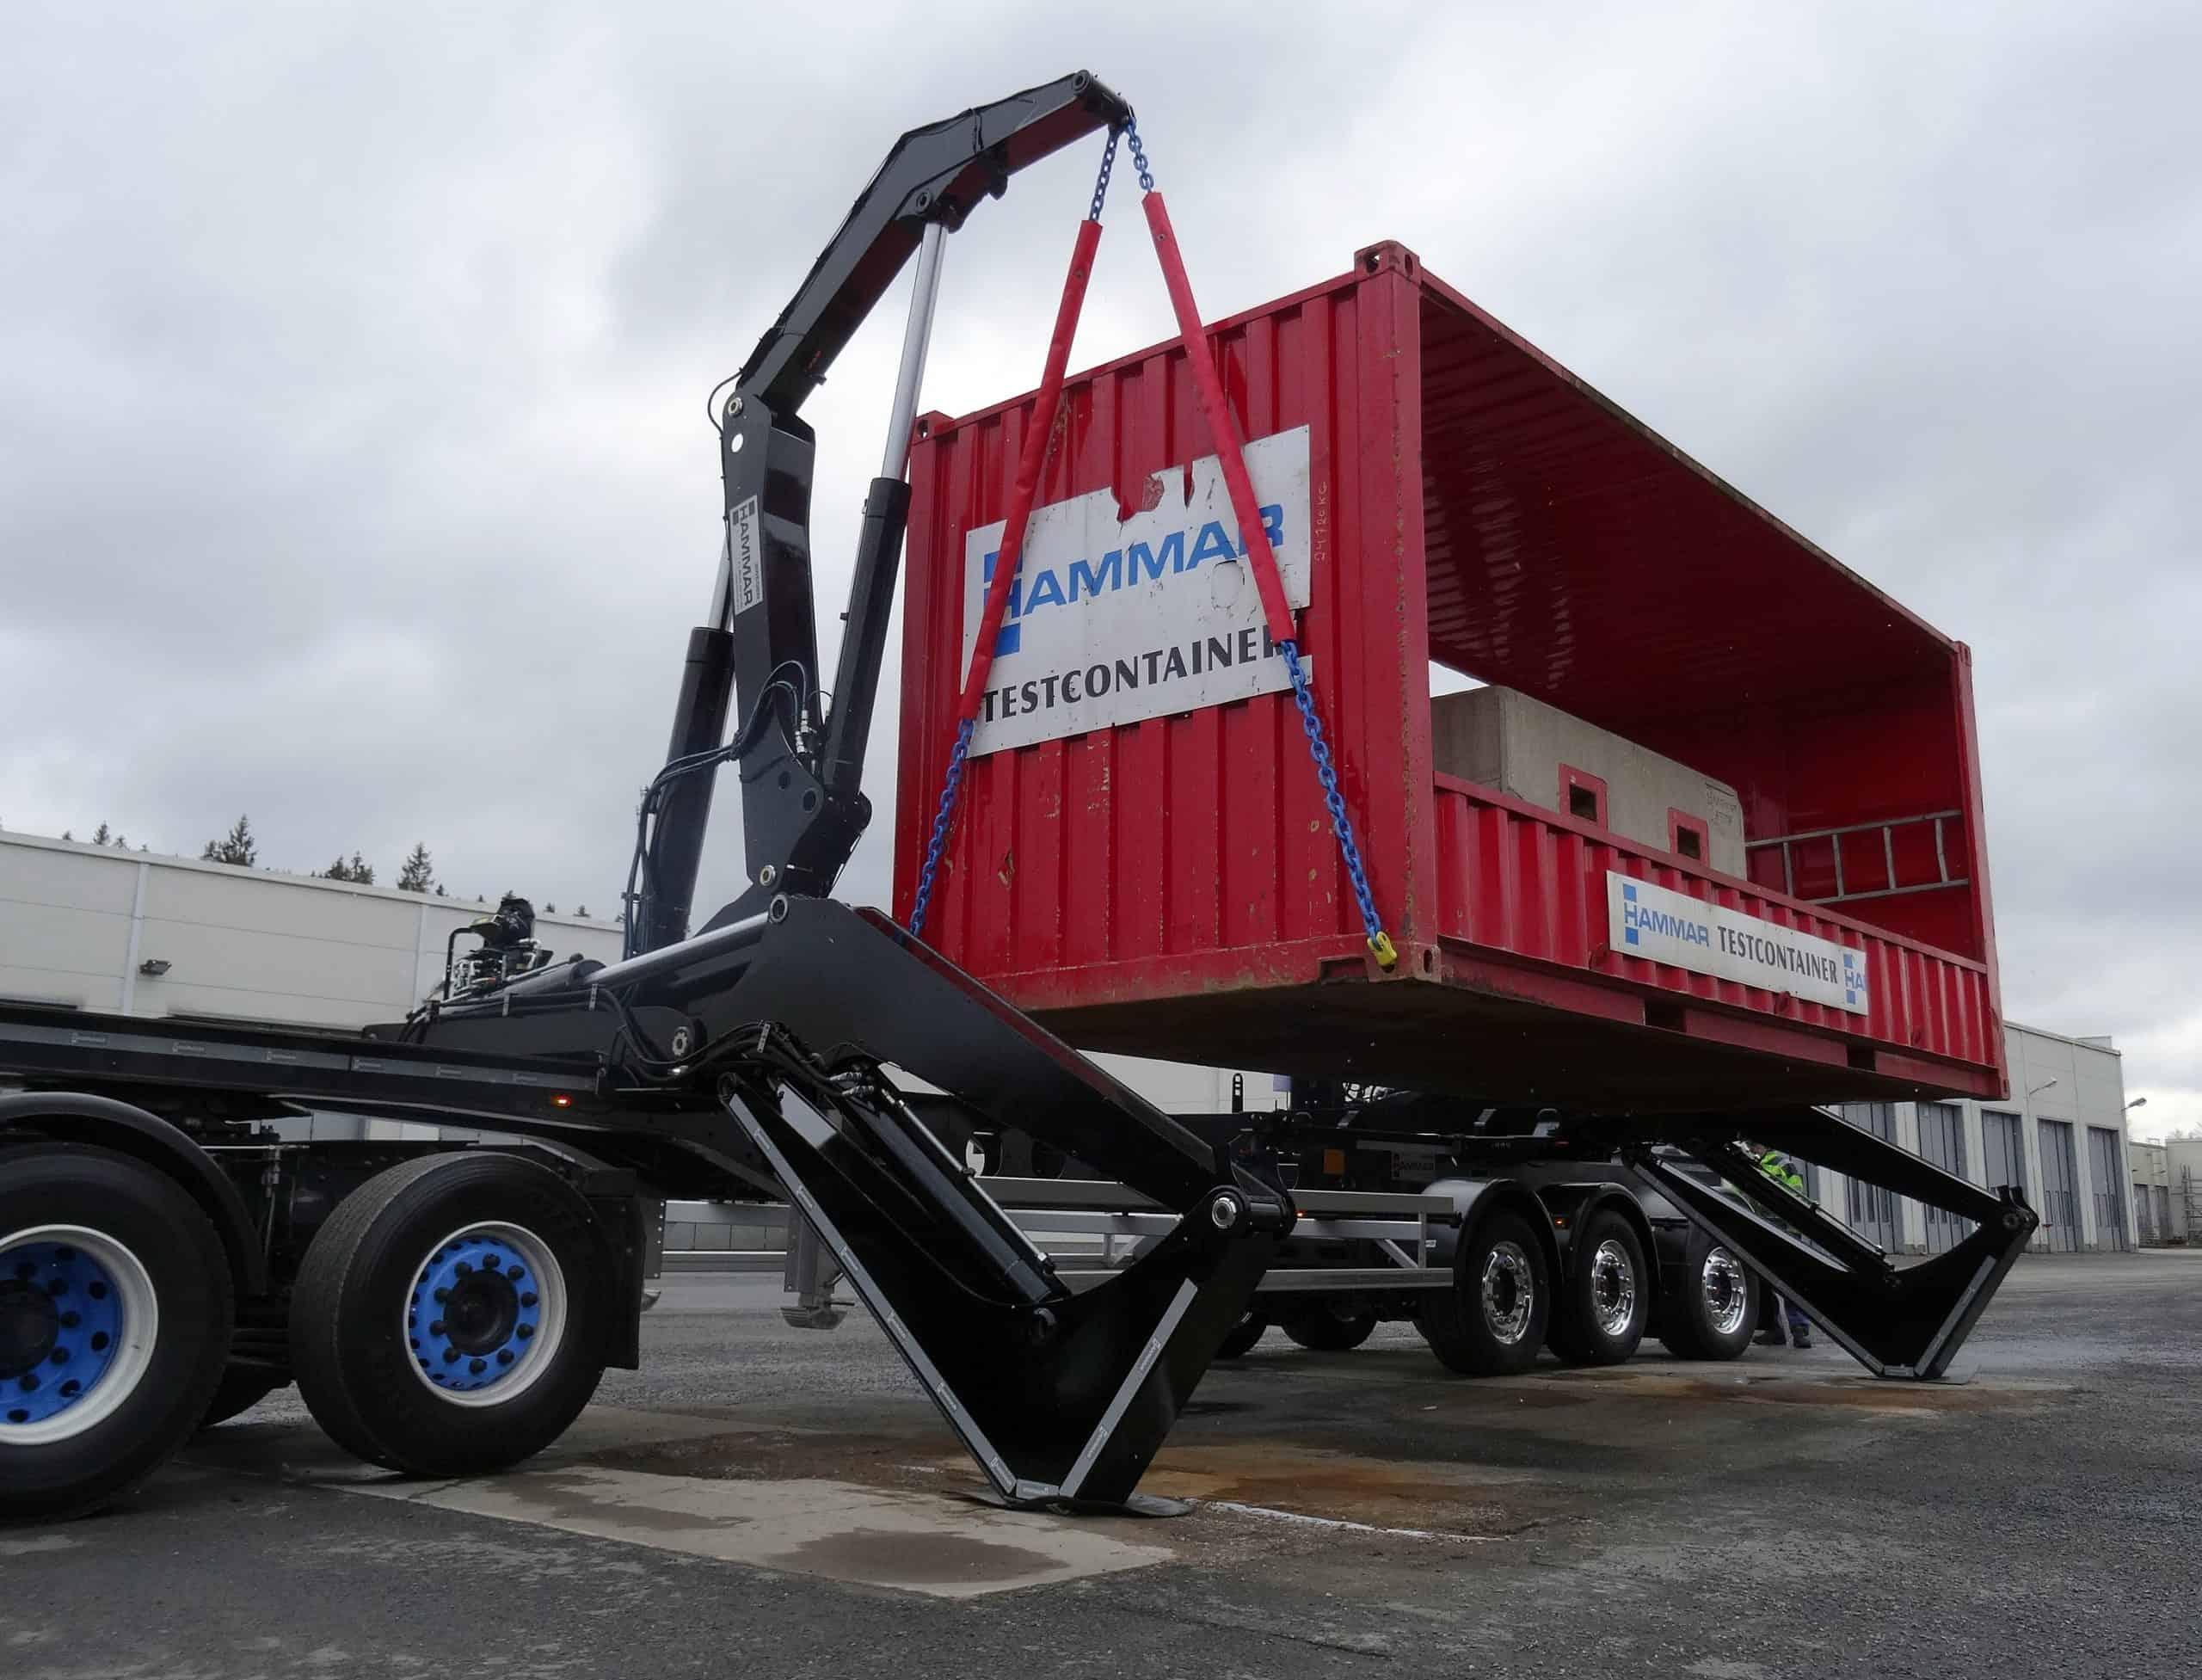 Hammar launches new sideloader